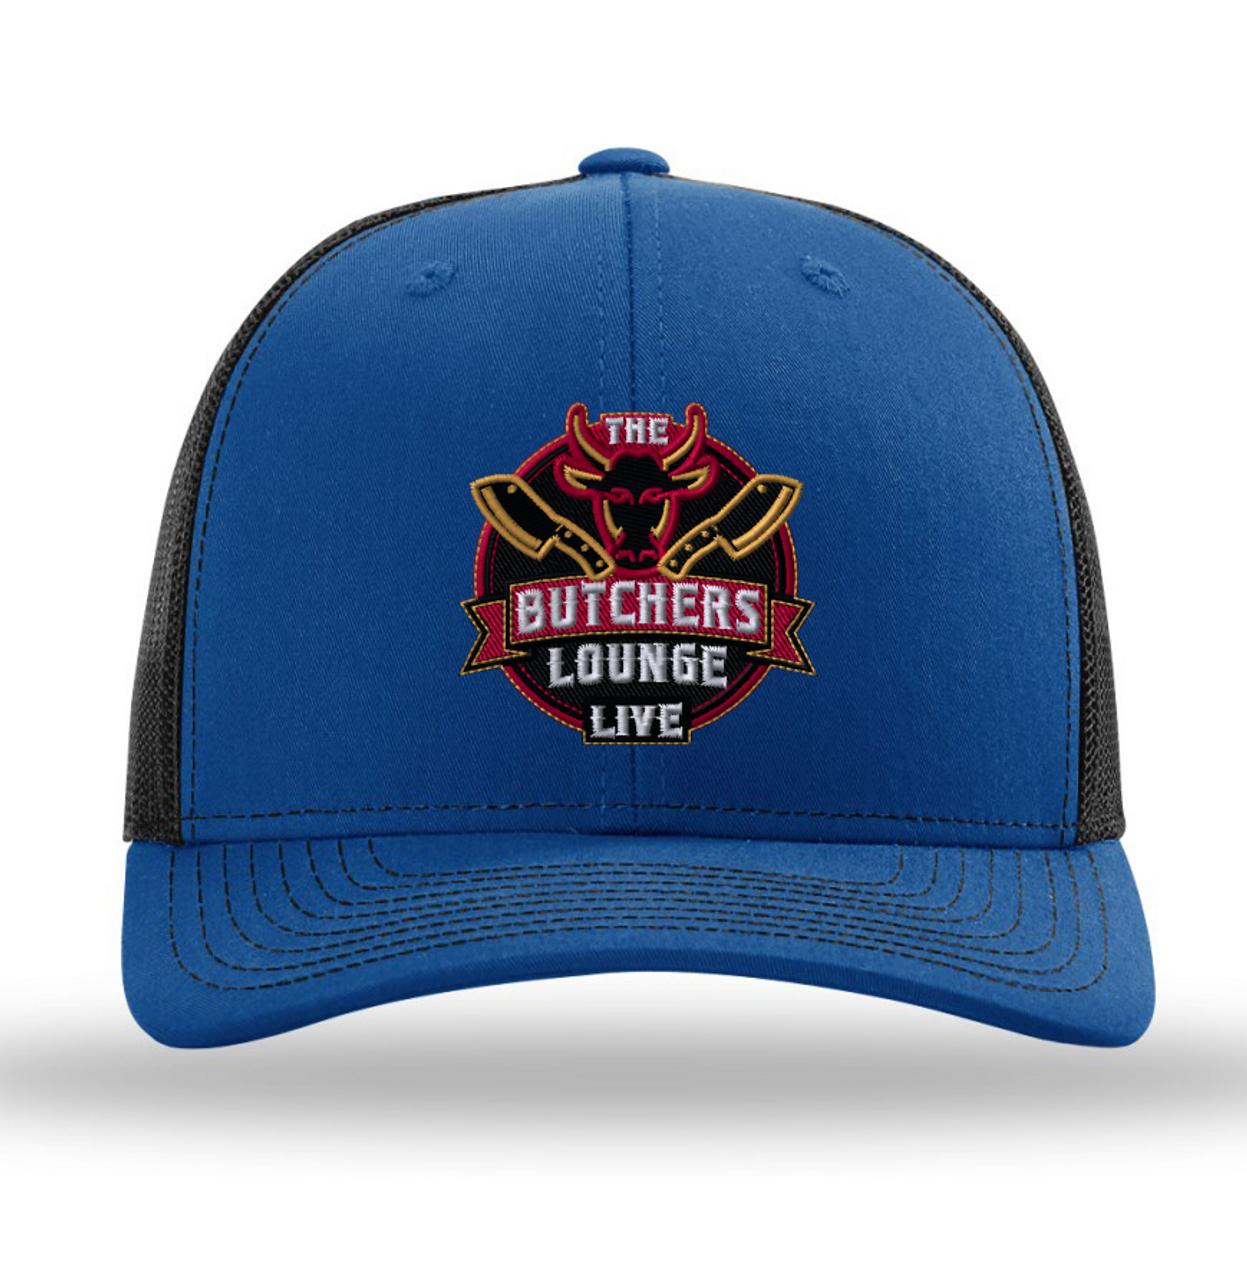 """The Butcher's Lounge Live"" -  Richardson 112 Trucker SnapBack - Royal/Black"